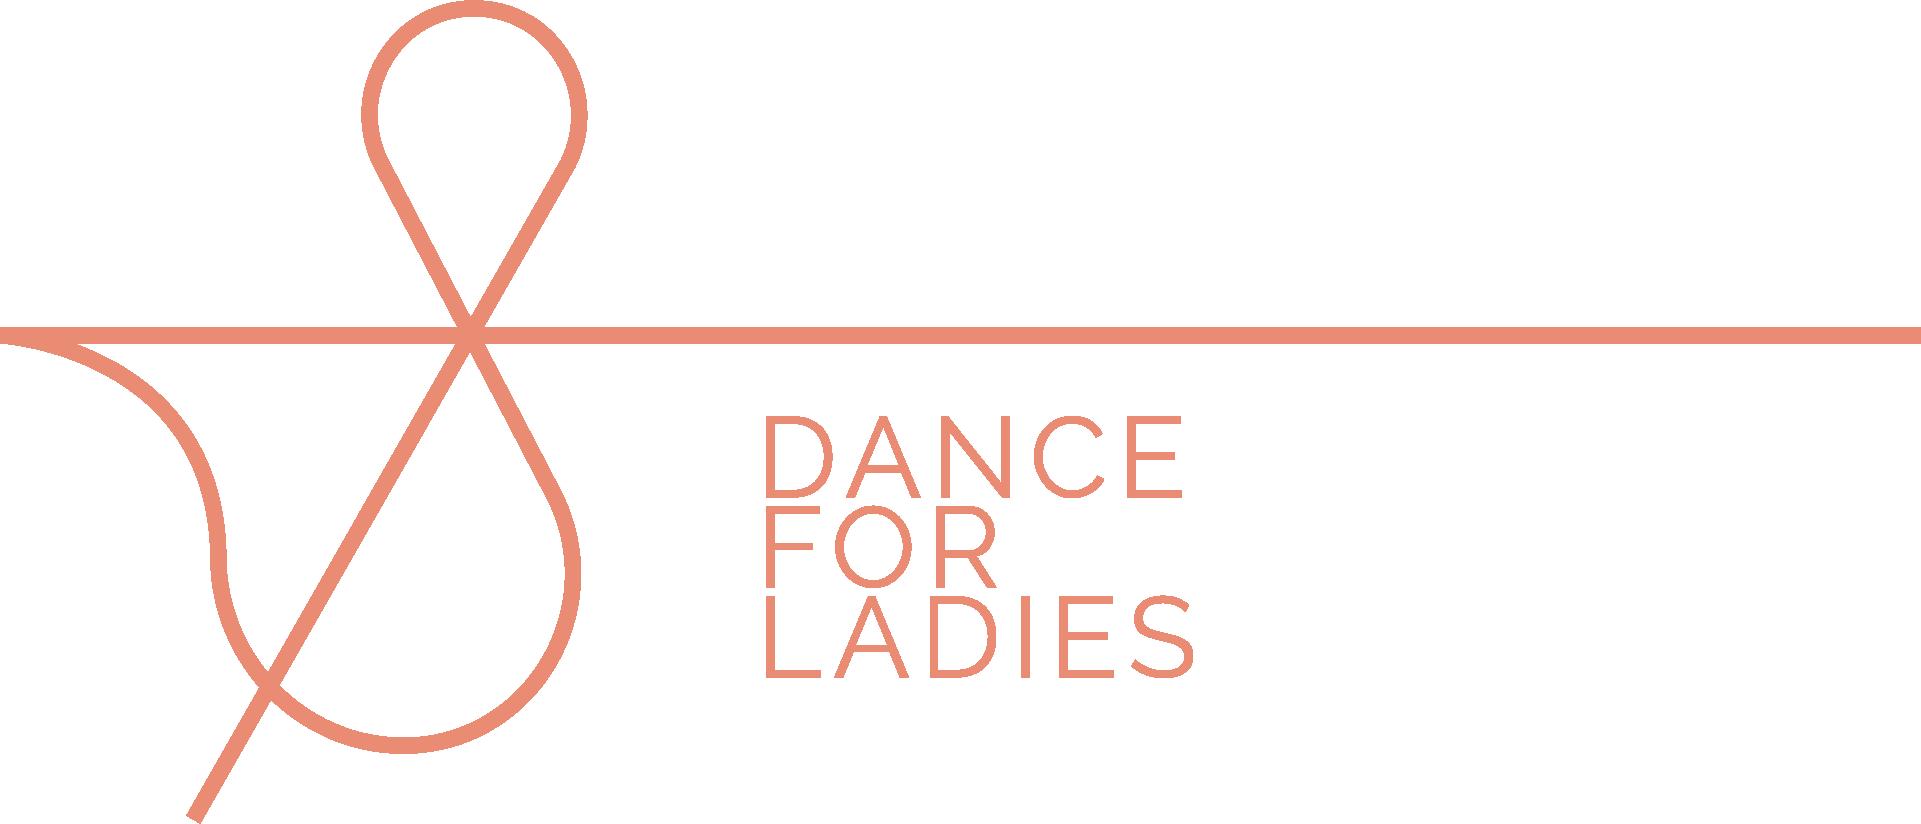 Dance for Ladies